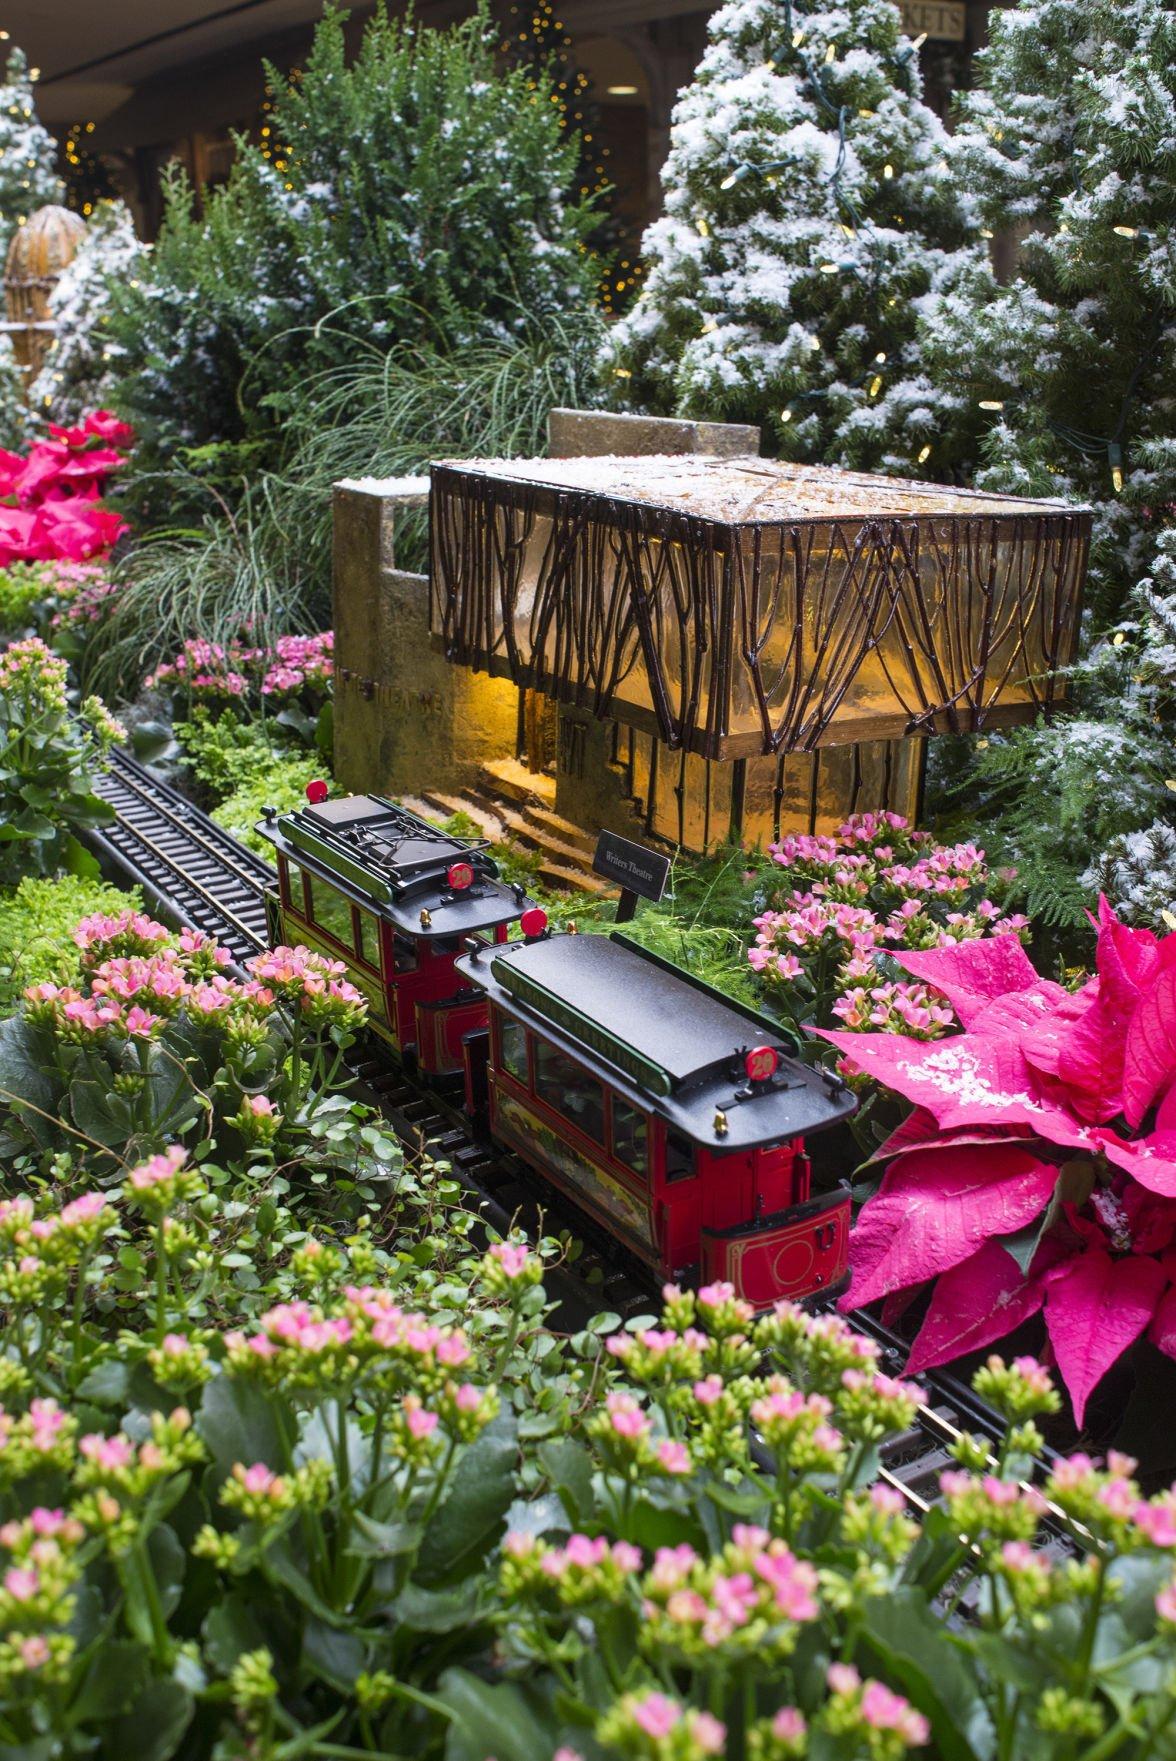 Chicago Botanic Garden indoor winter railroad